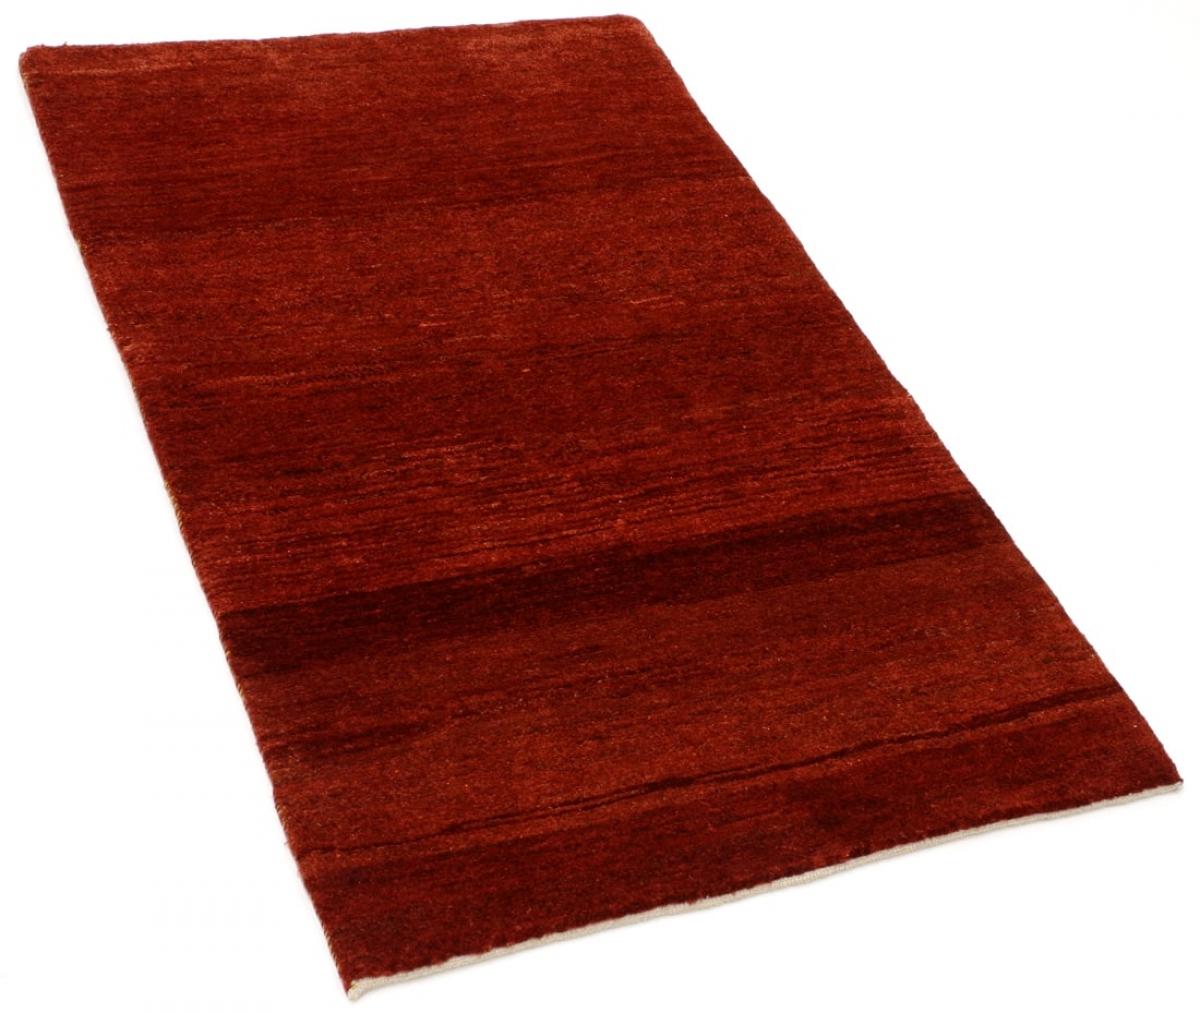 perserteppich gabbeh rot 83x138cm. Black Bedroom Furniture Sets. Home Design Ideas